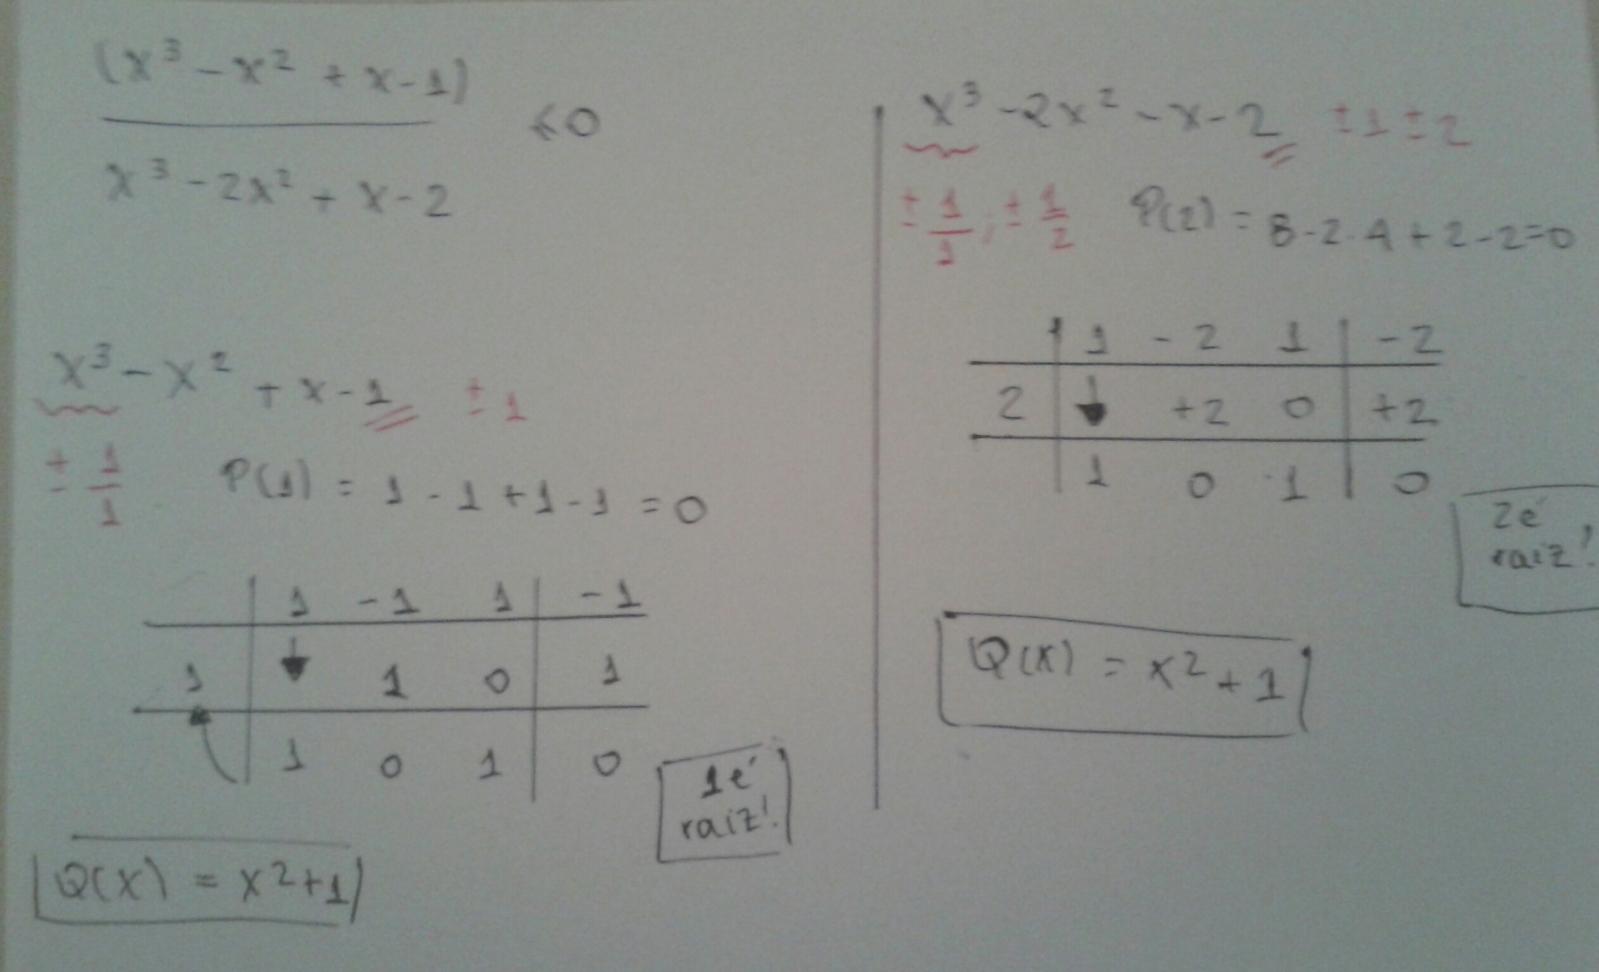 UFT- inequação 23u2z3k